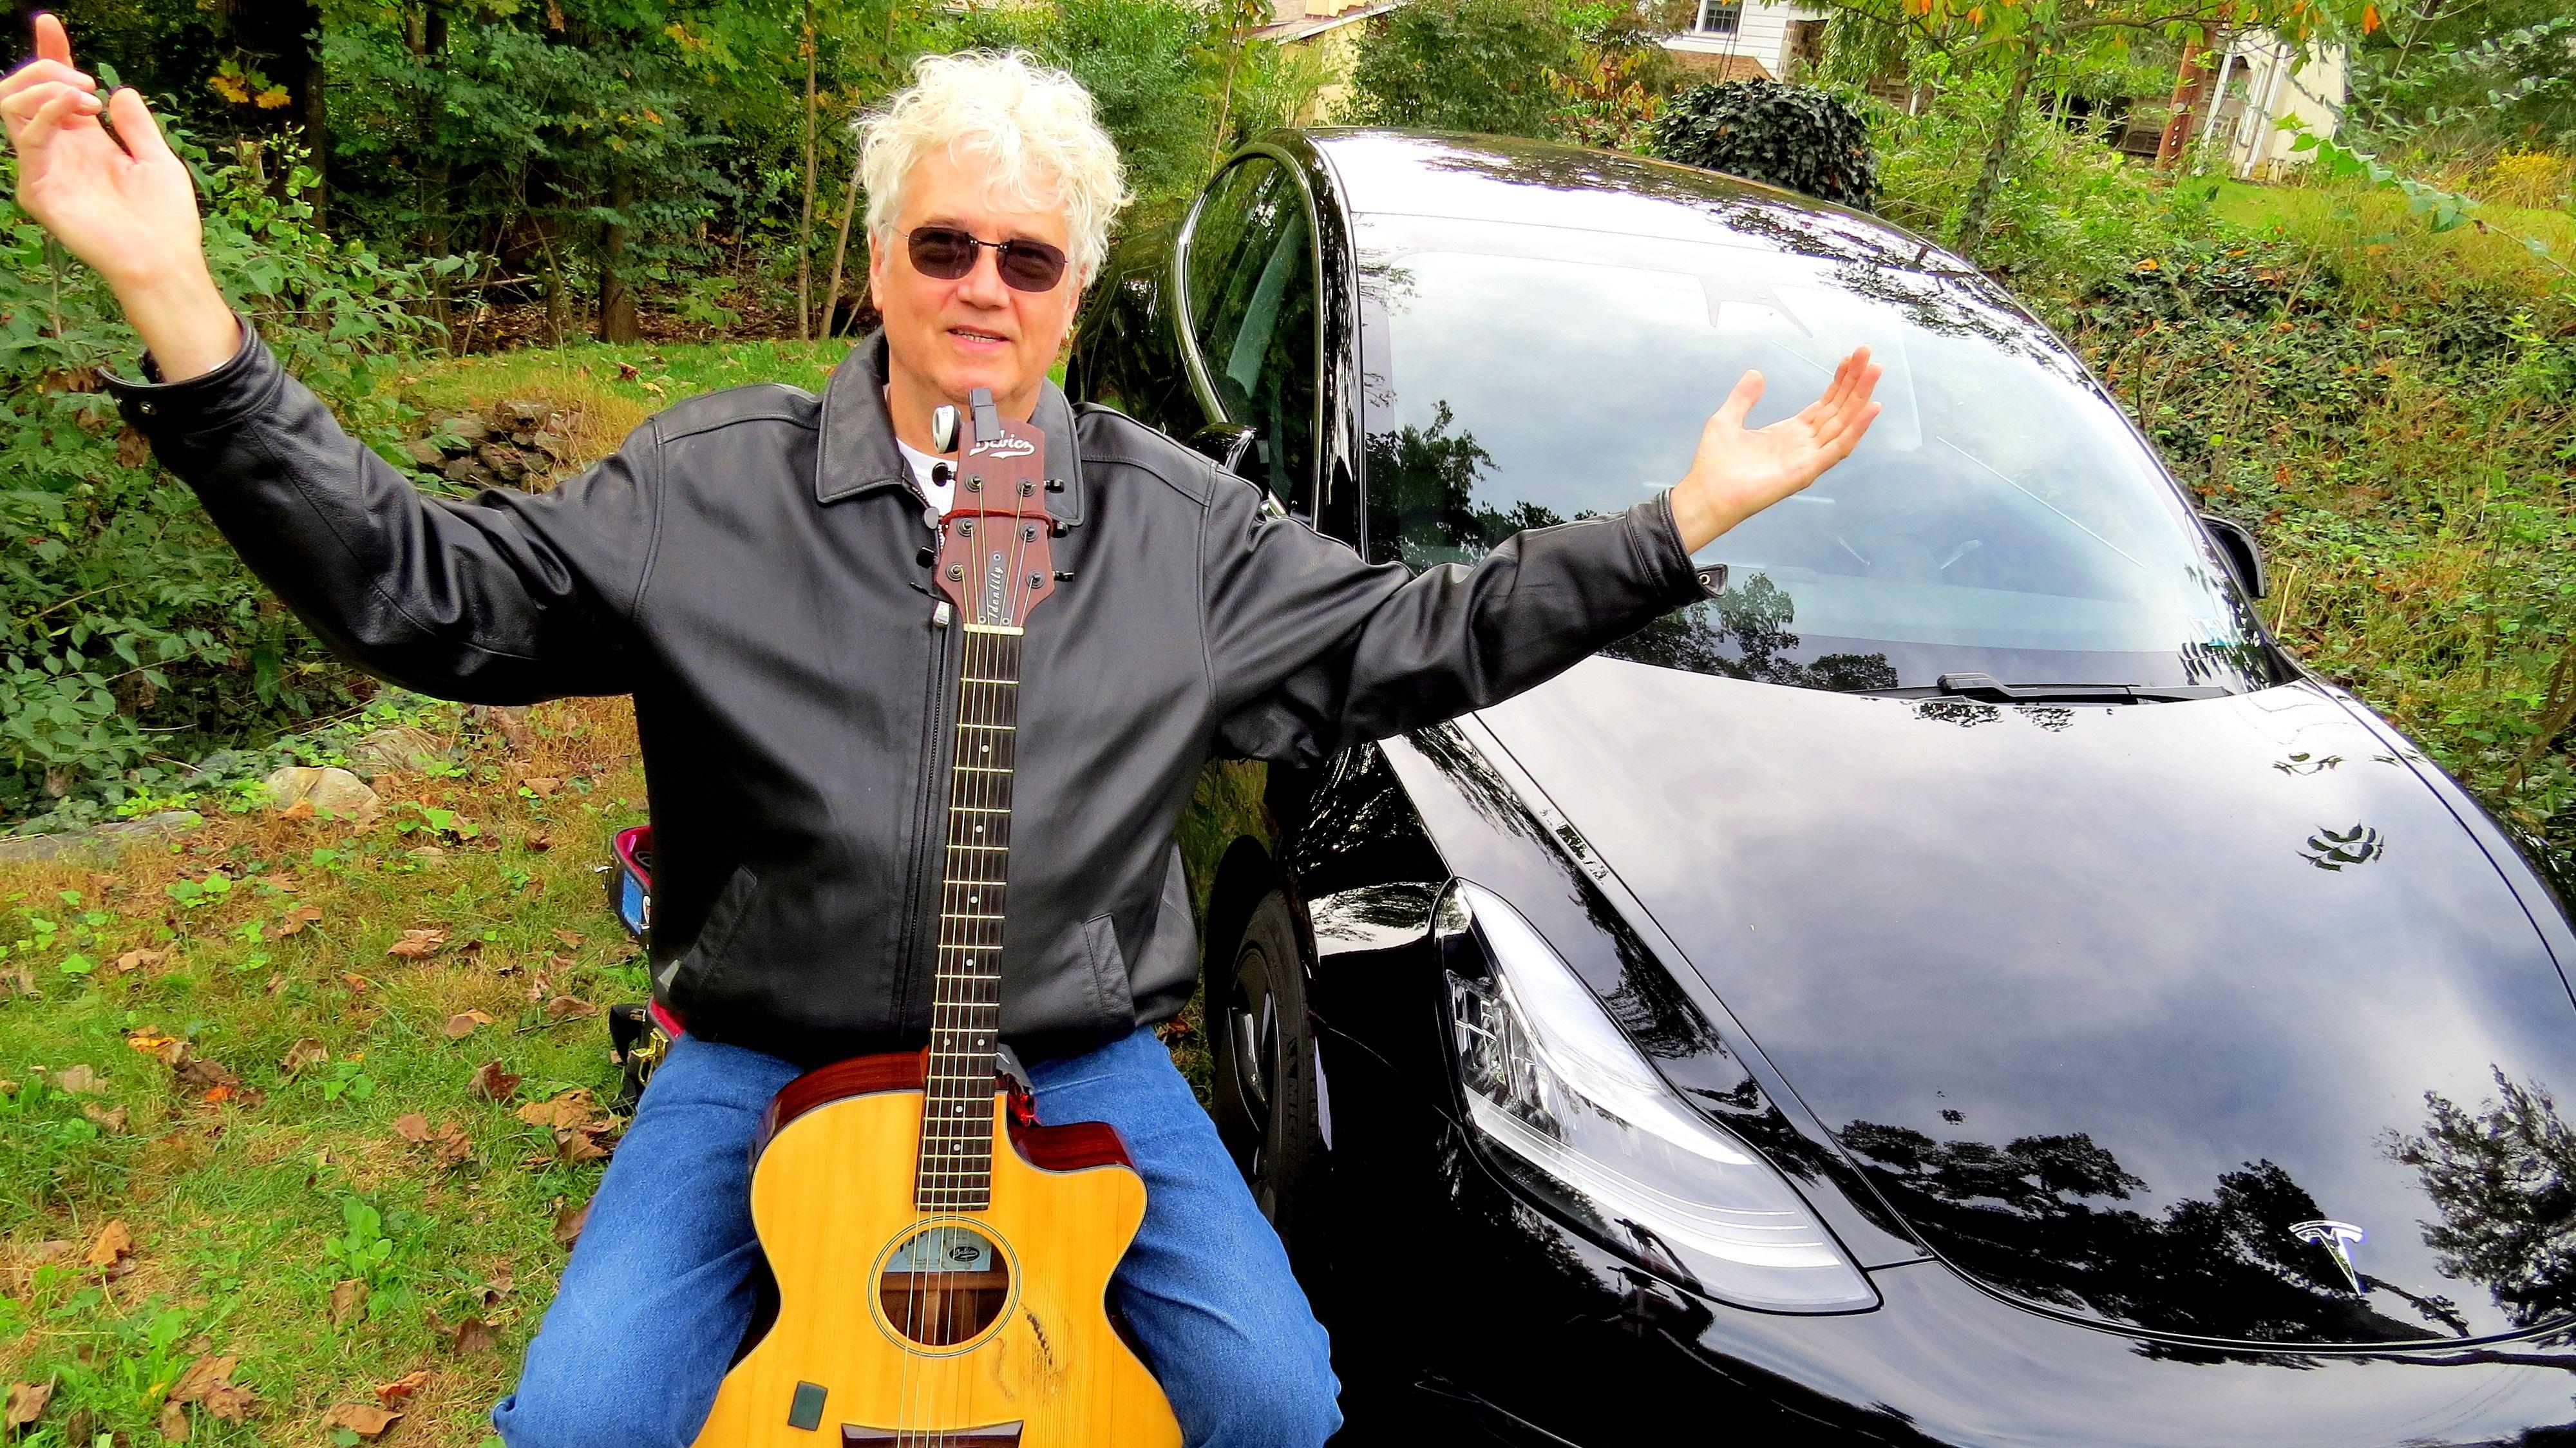 Photo RickDenzien ZeroEmissionMusicianBreaks Record In Tesla